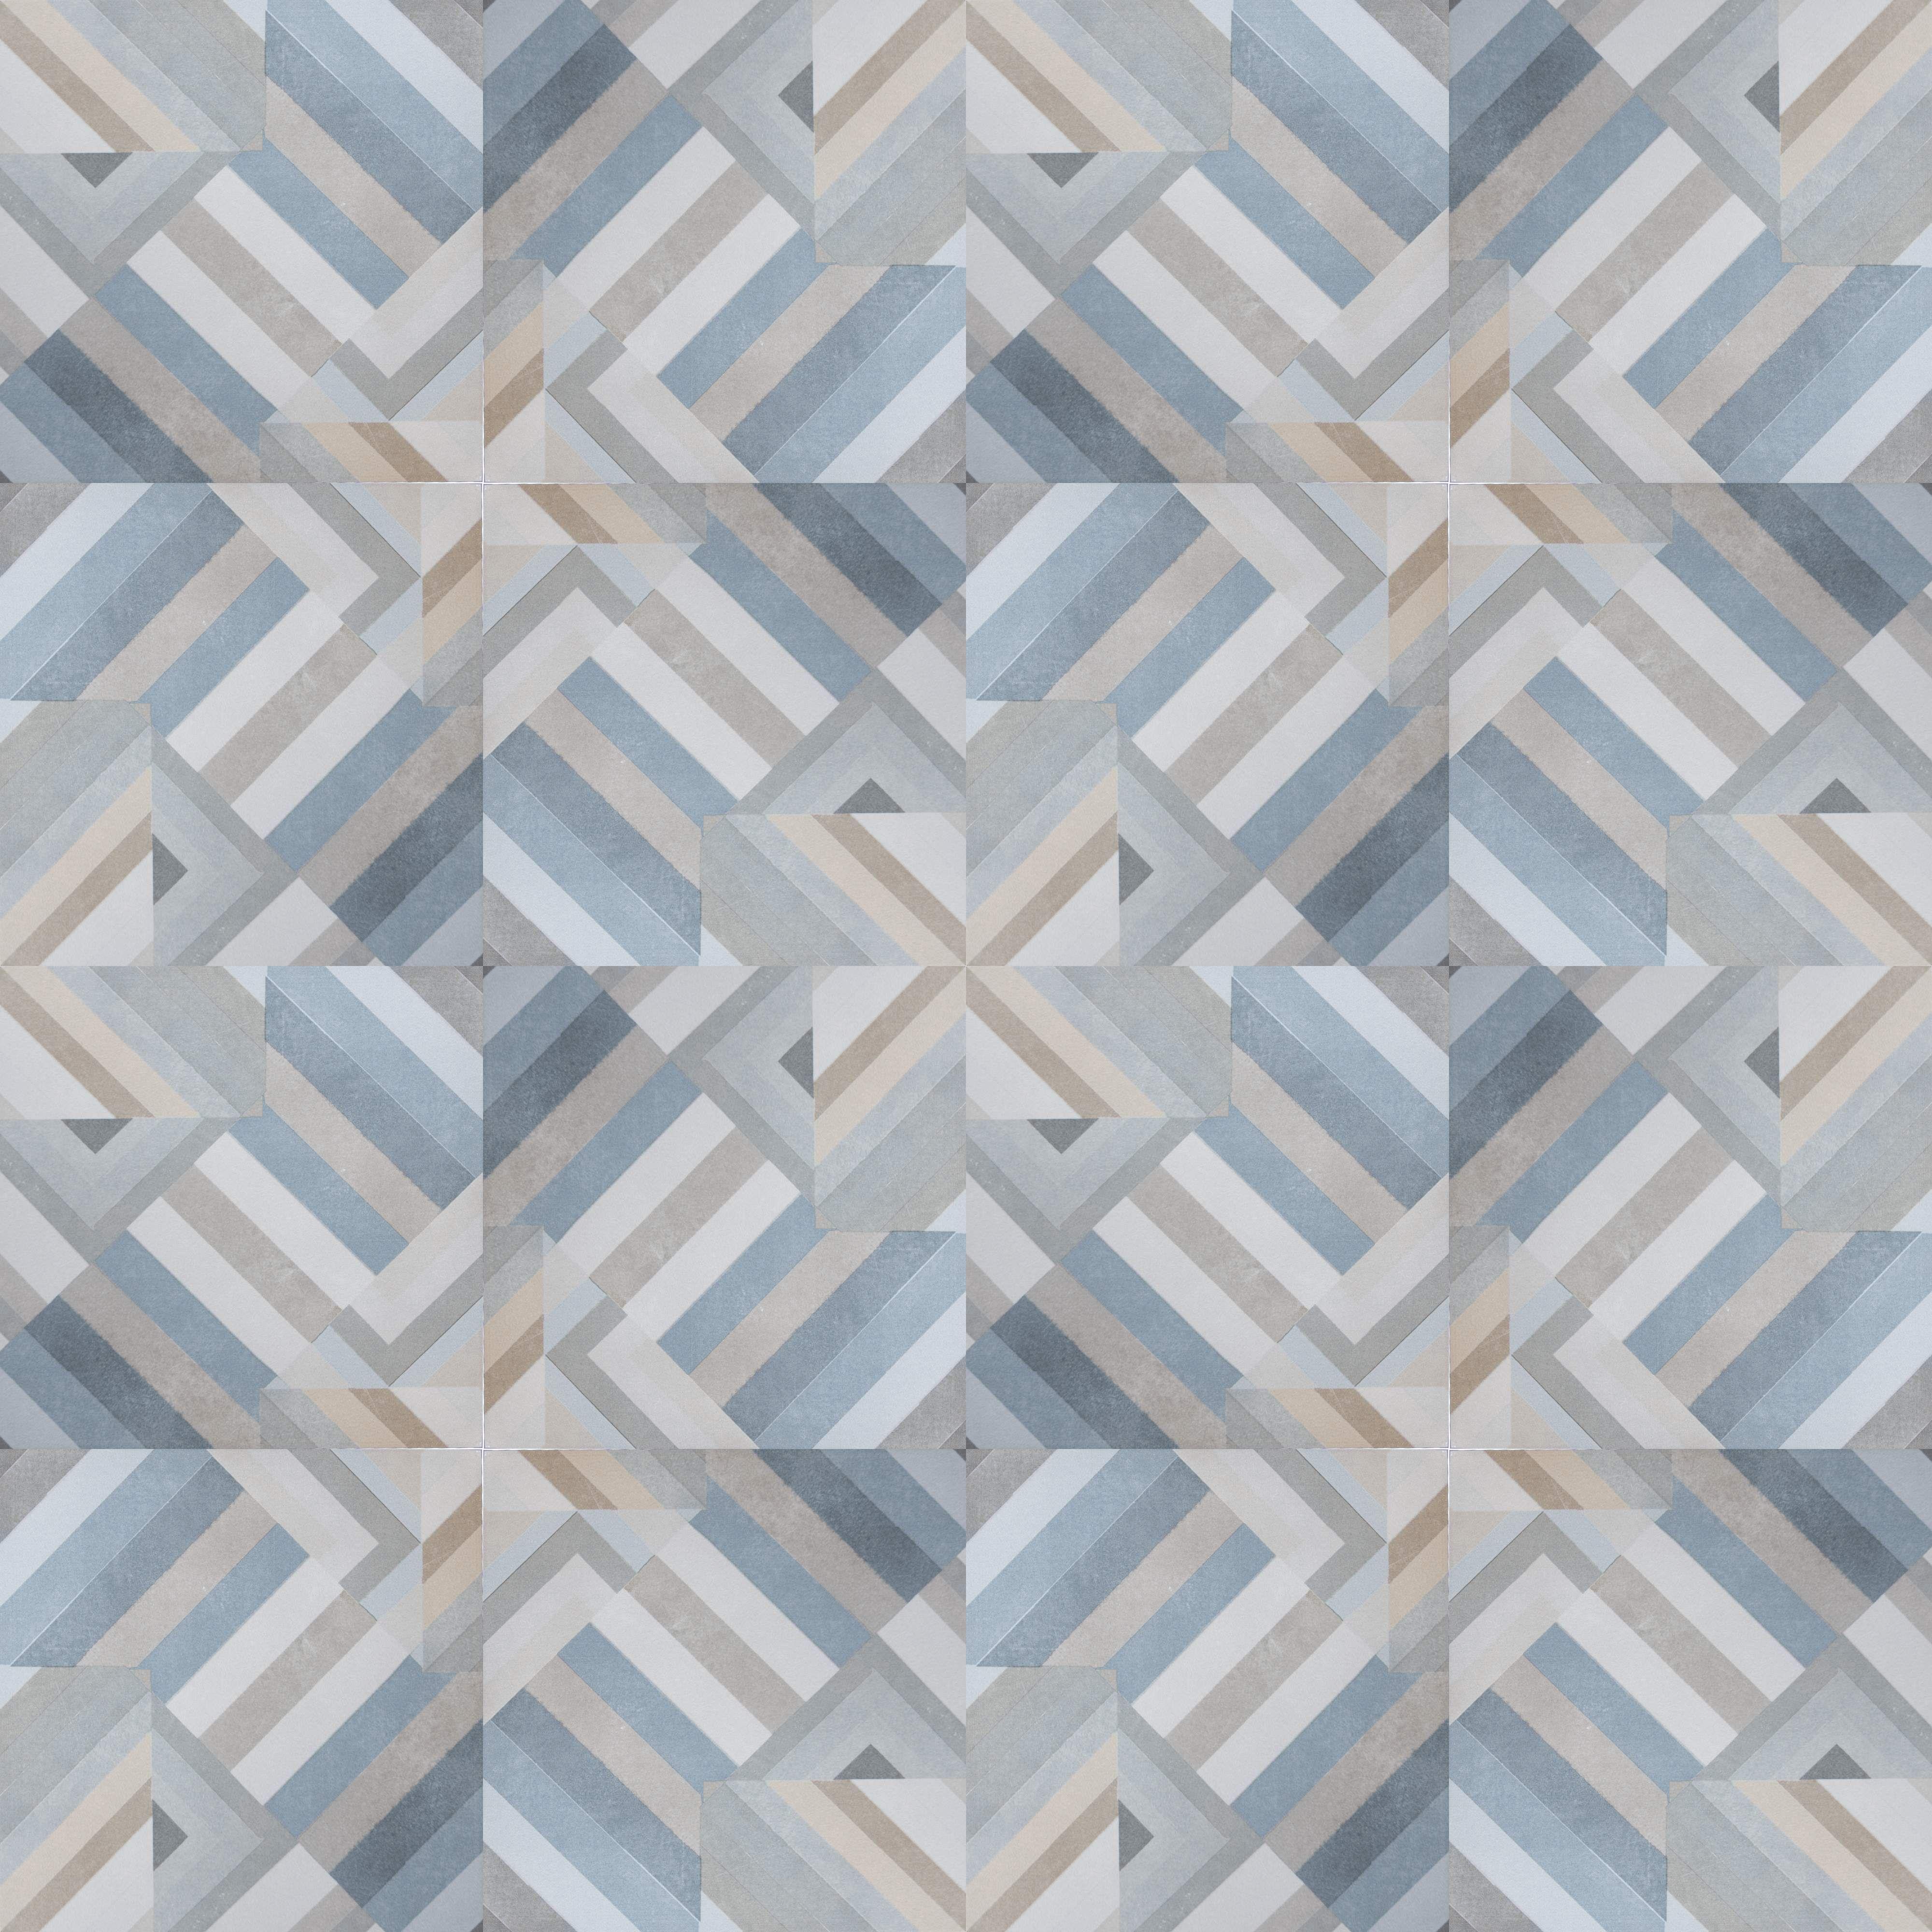 Patricia urquiola for mutina tiles of italy prata porcelain tiles from the 39 azulej 39 collection - Piastrelle decorative per pareti ...